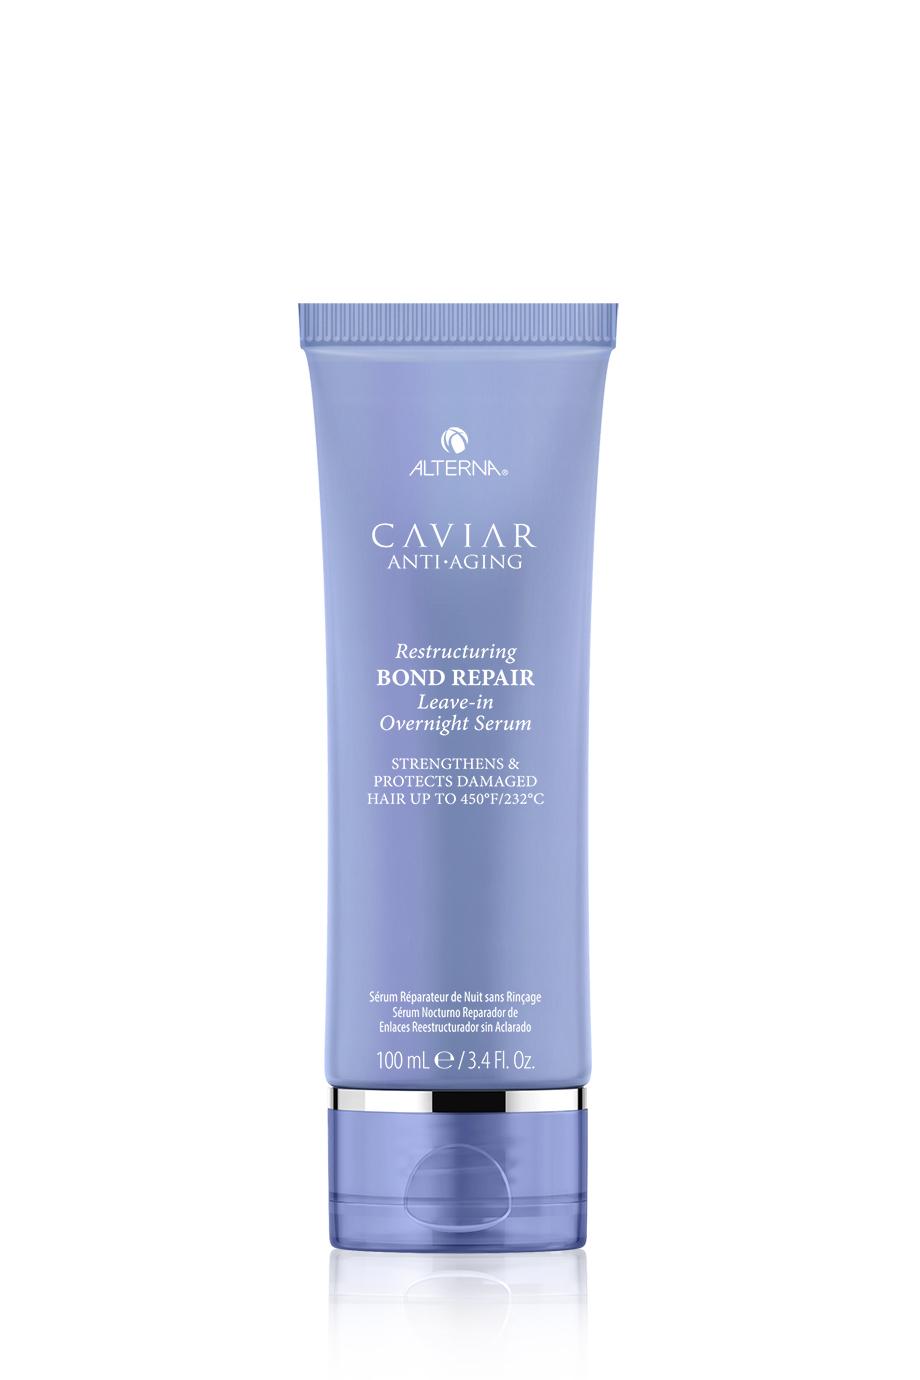 CAVIAR Anti-Aging Restructuring Bond Repair Leave-in Overnight Serum Регенерирующая ночная сыворотка для омоложения волос, 100мл